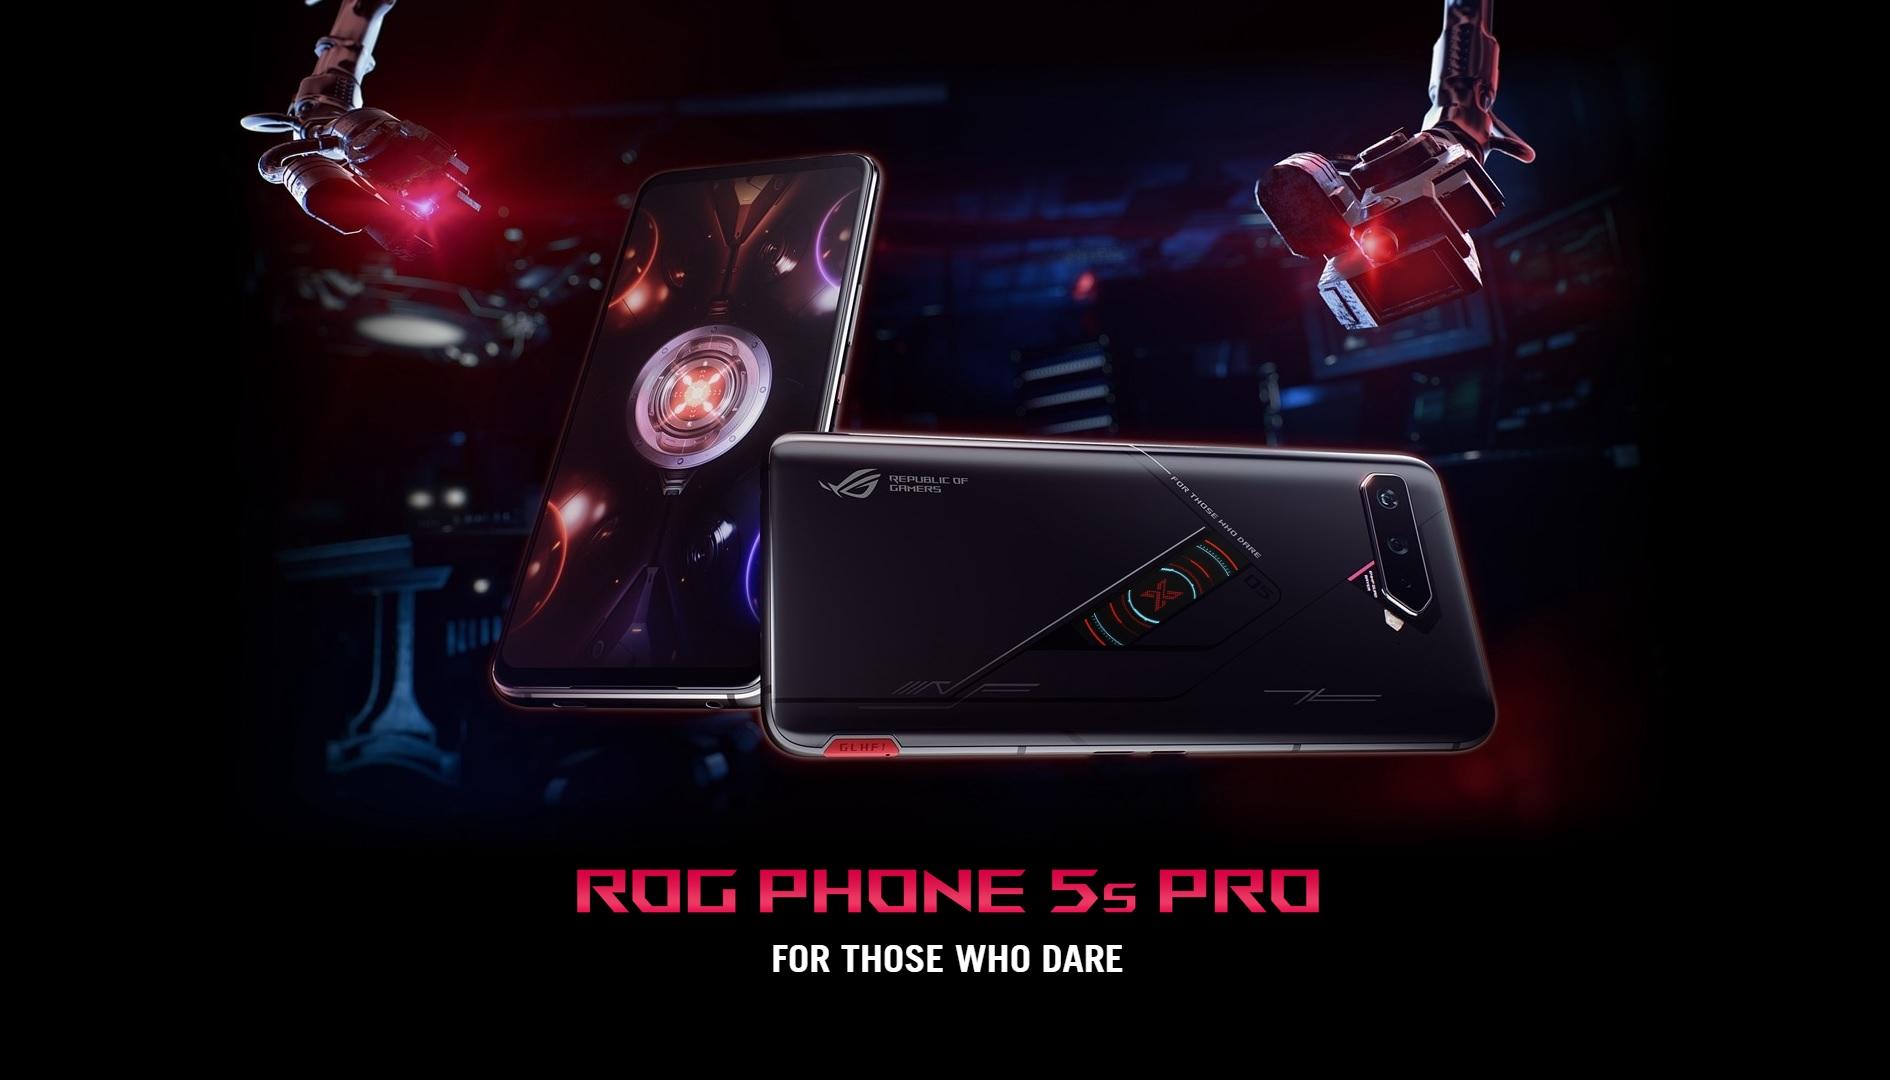 ASUS ROG PHONE 5S PRO MAIN BANNER